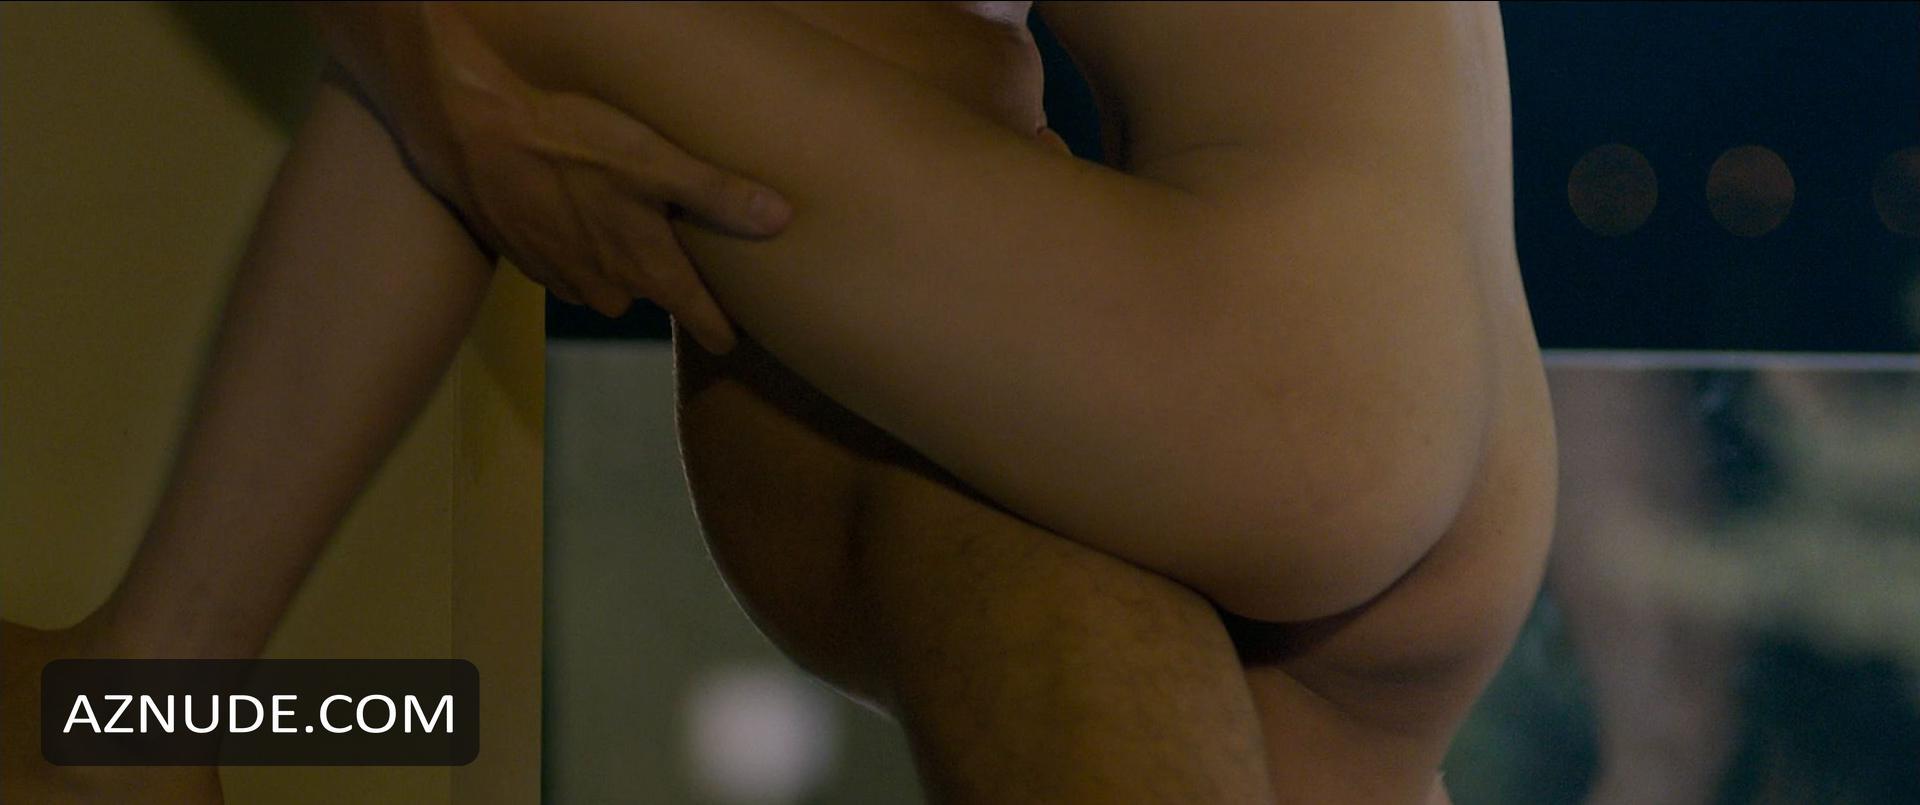 Sexy Fiona Mcnab Nude Png